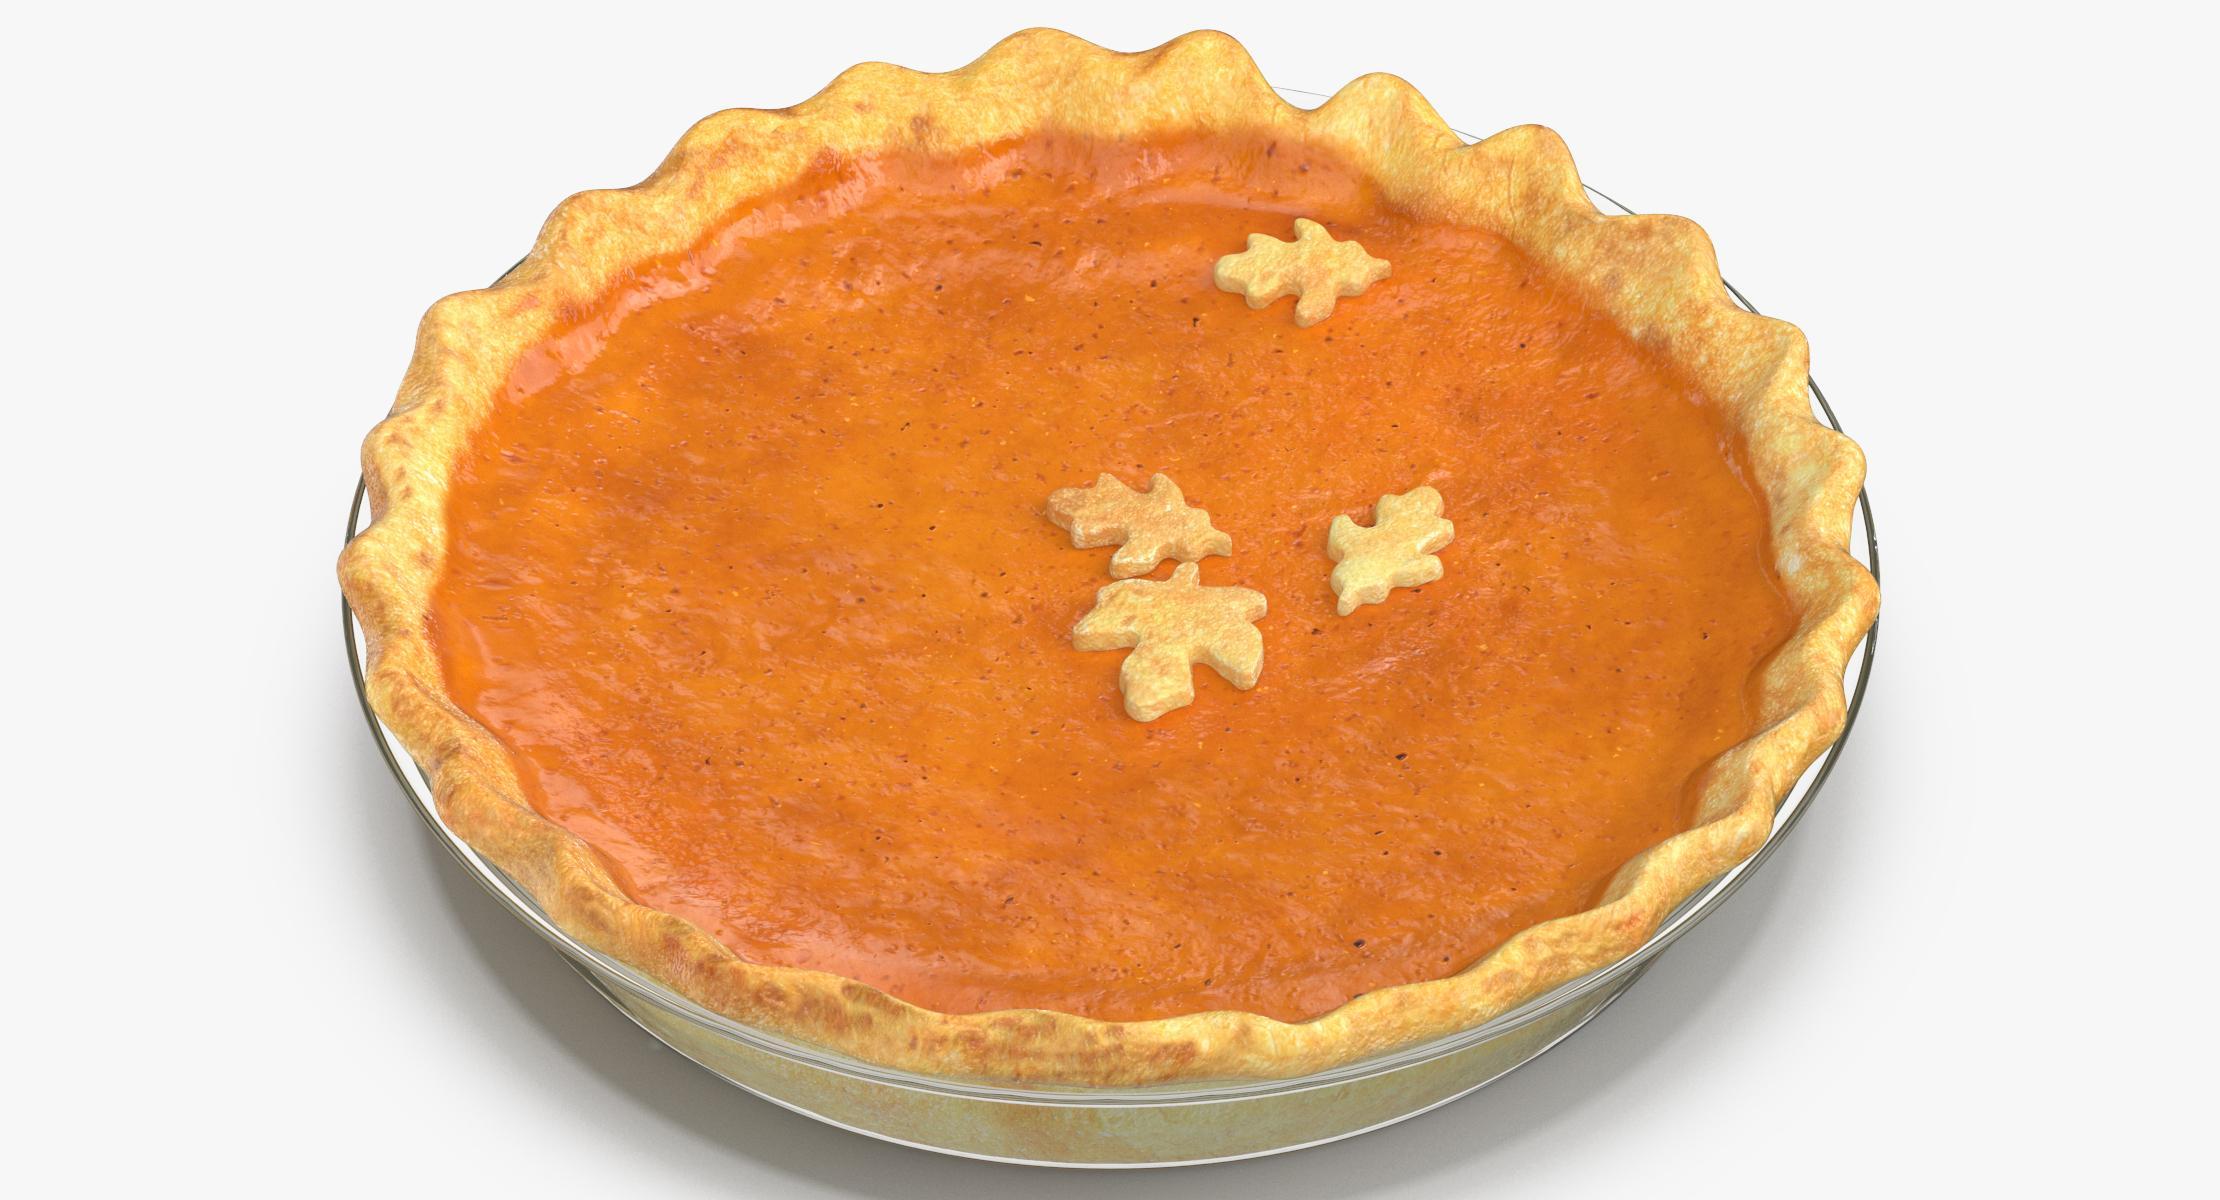 Pumpkin Pie 01 - reel 1